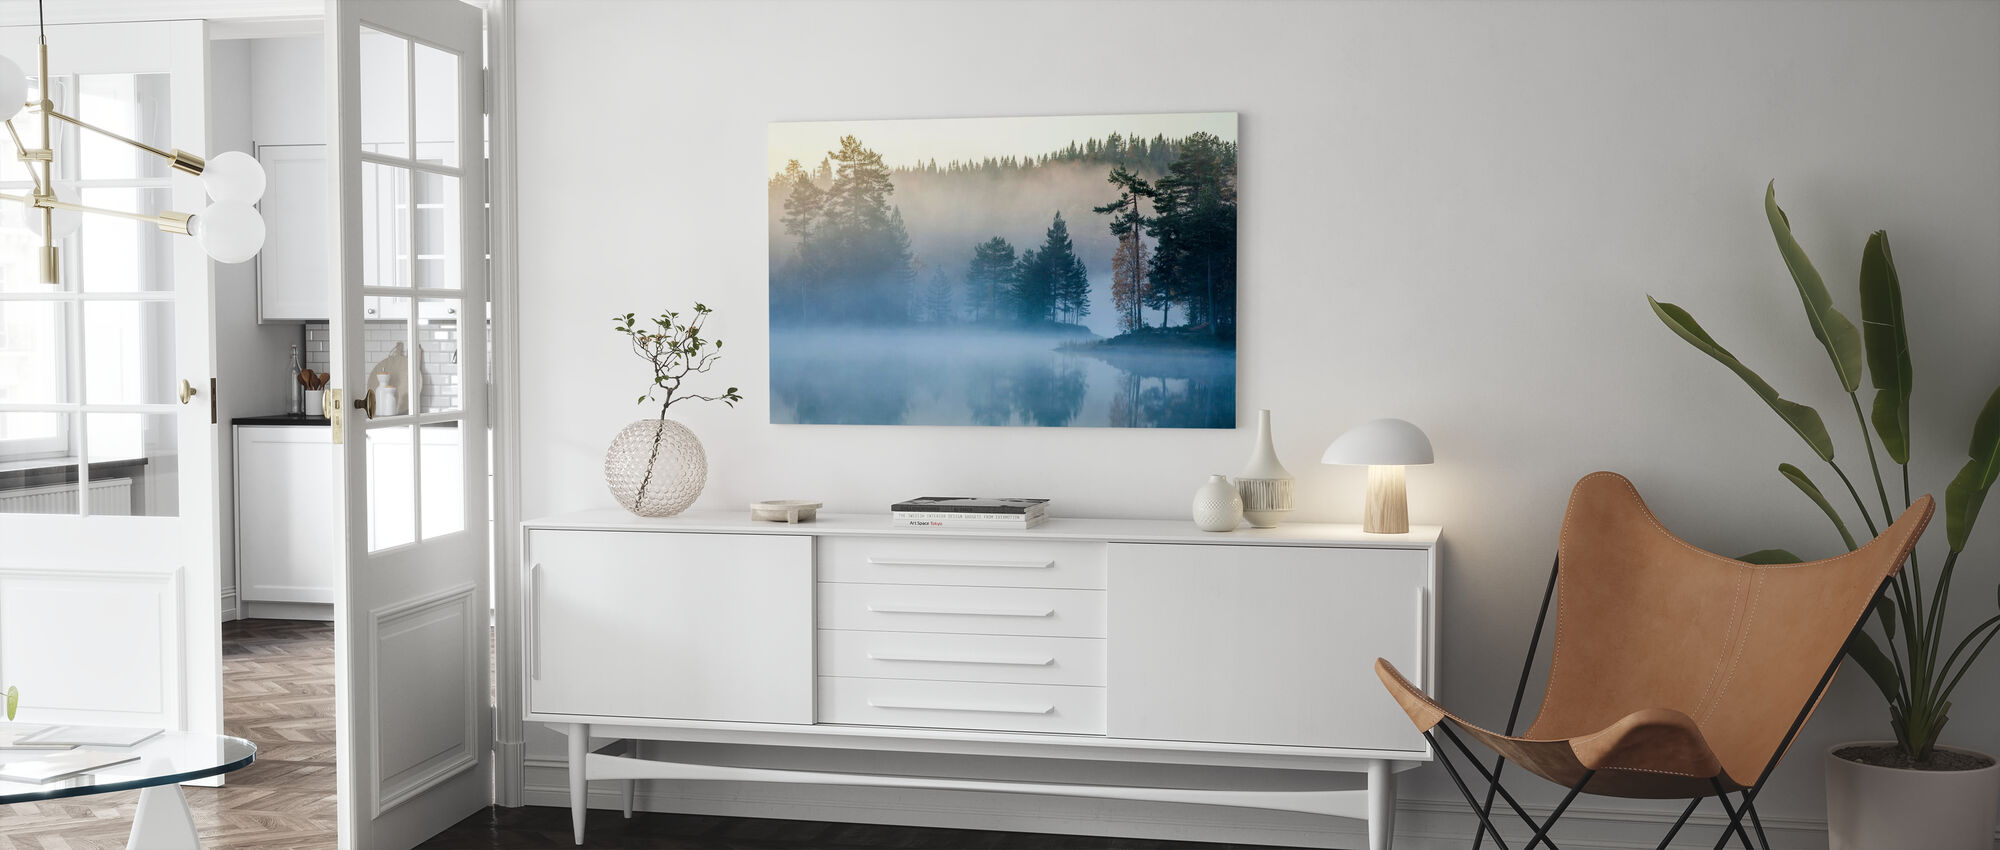 Nebbia norvegese - Stampa su tela - Salotto